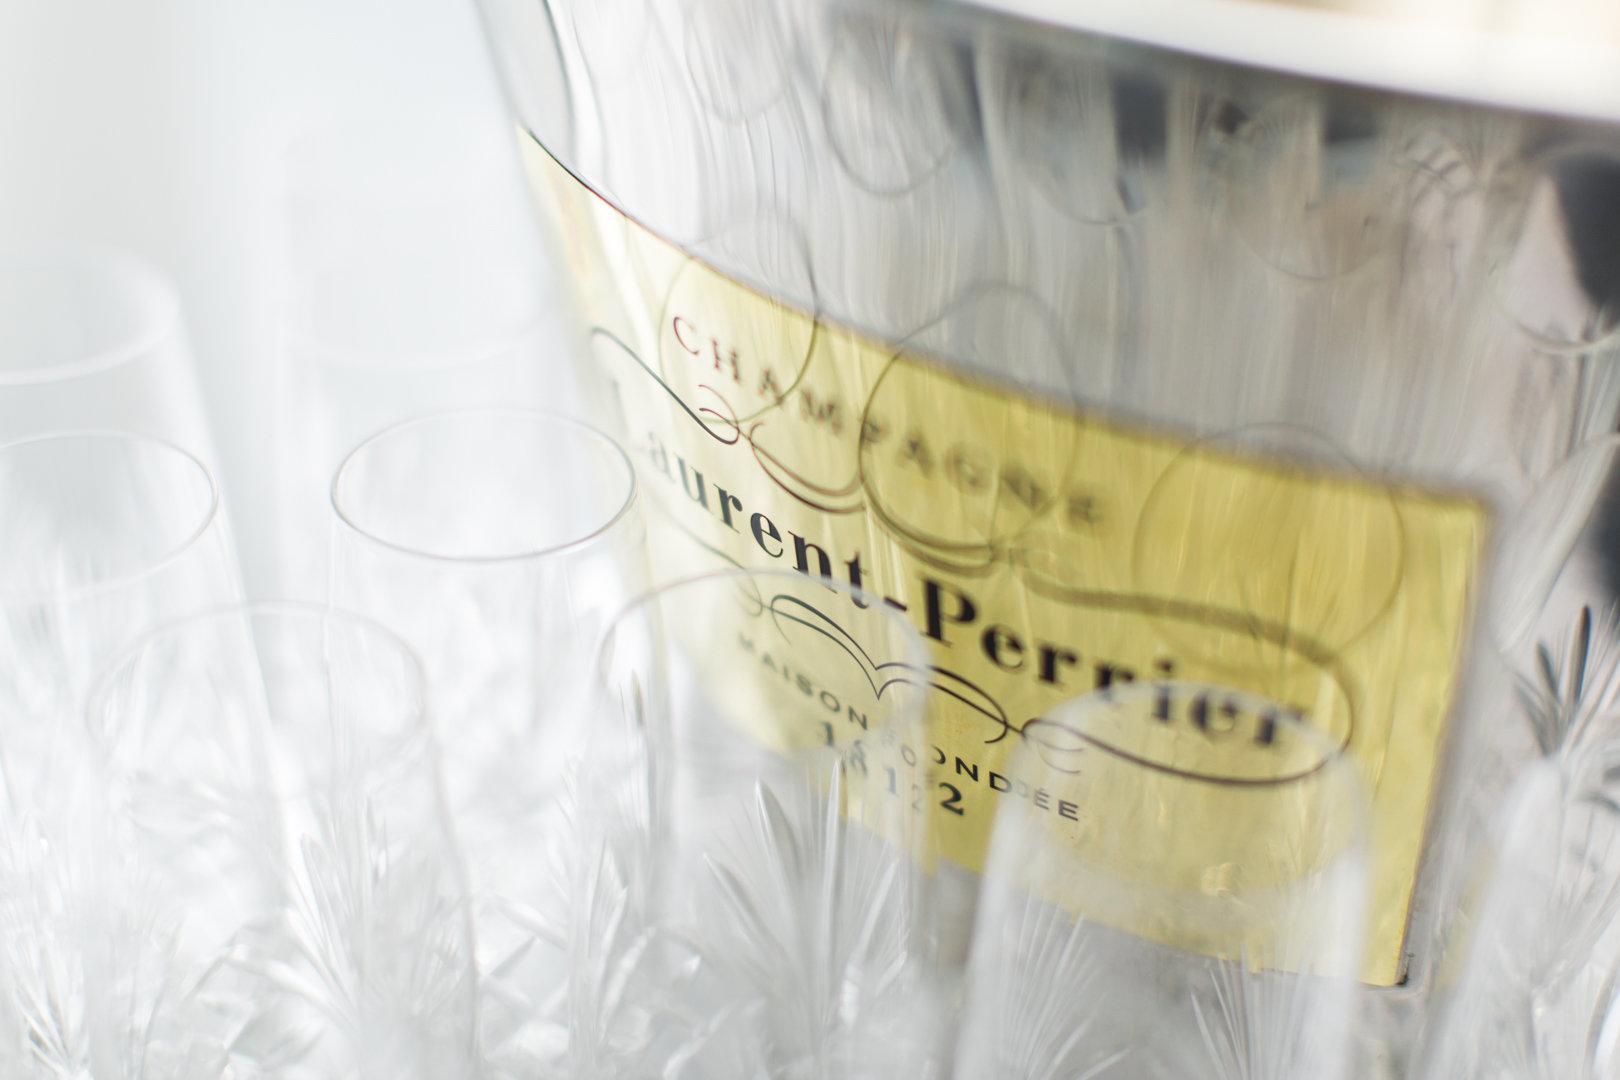 boreham house champagne